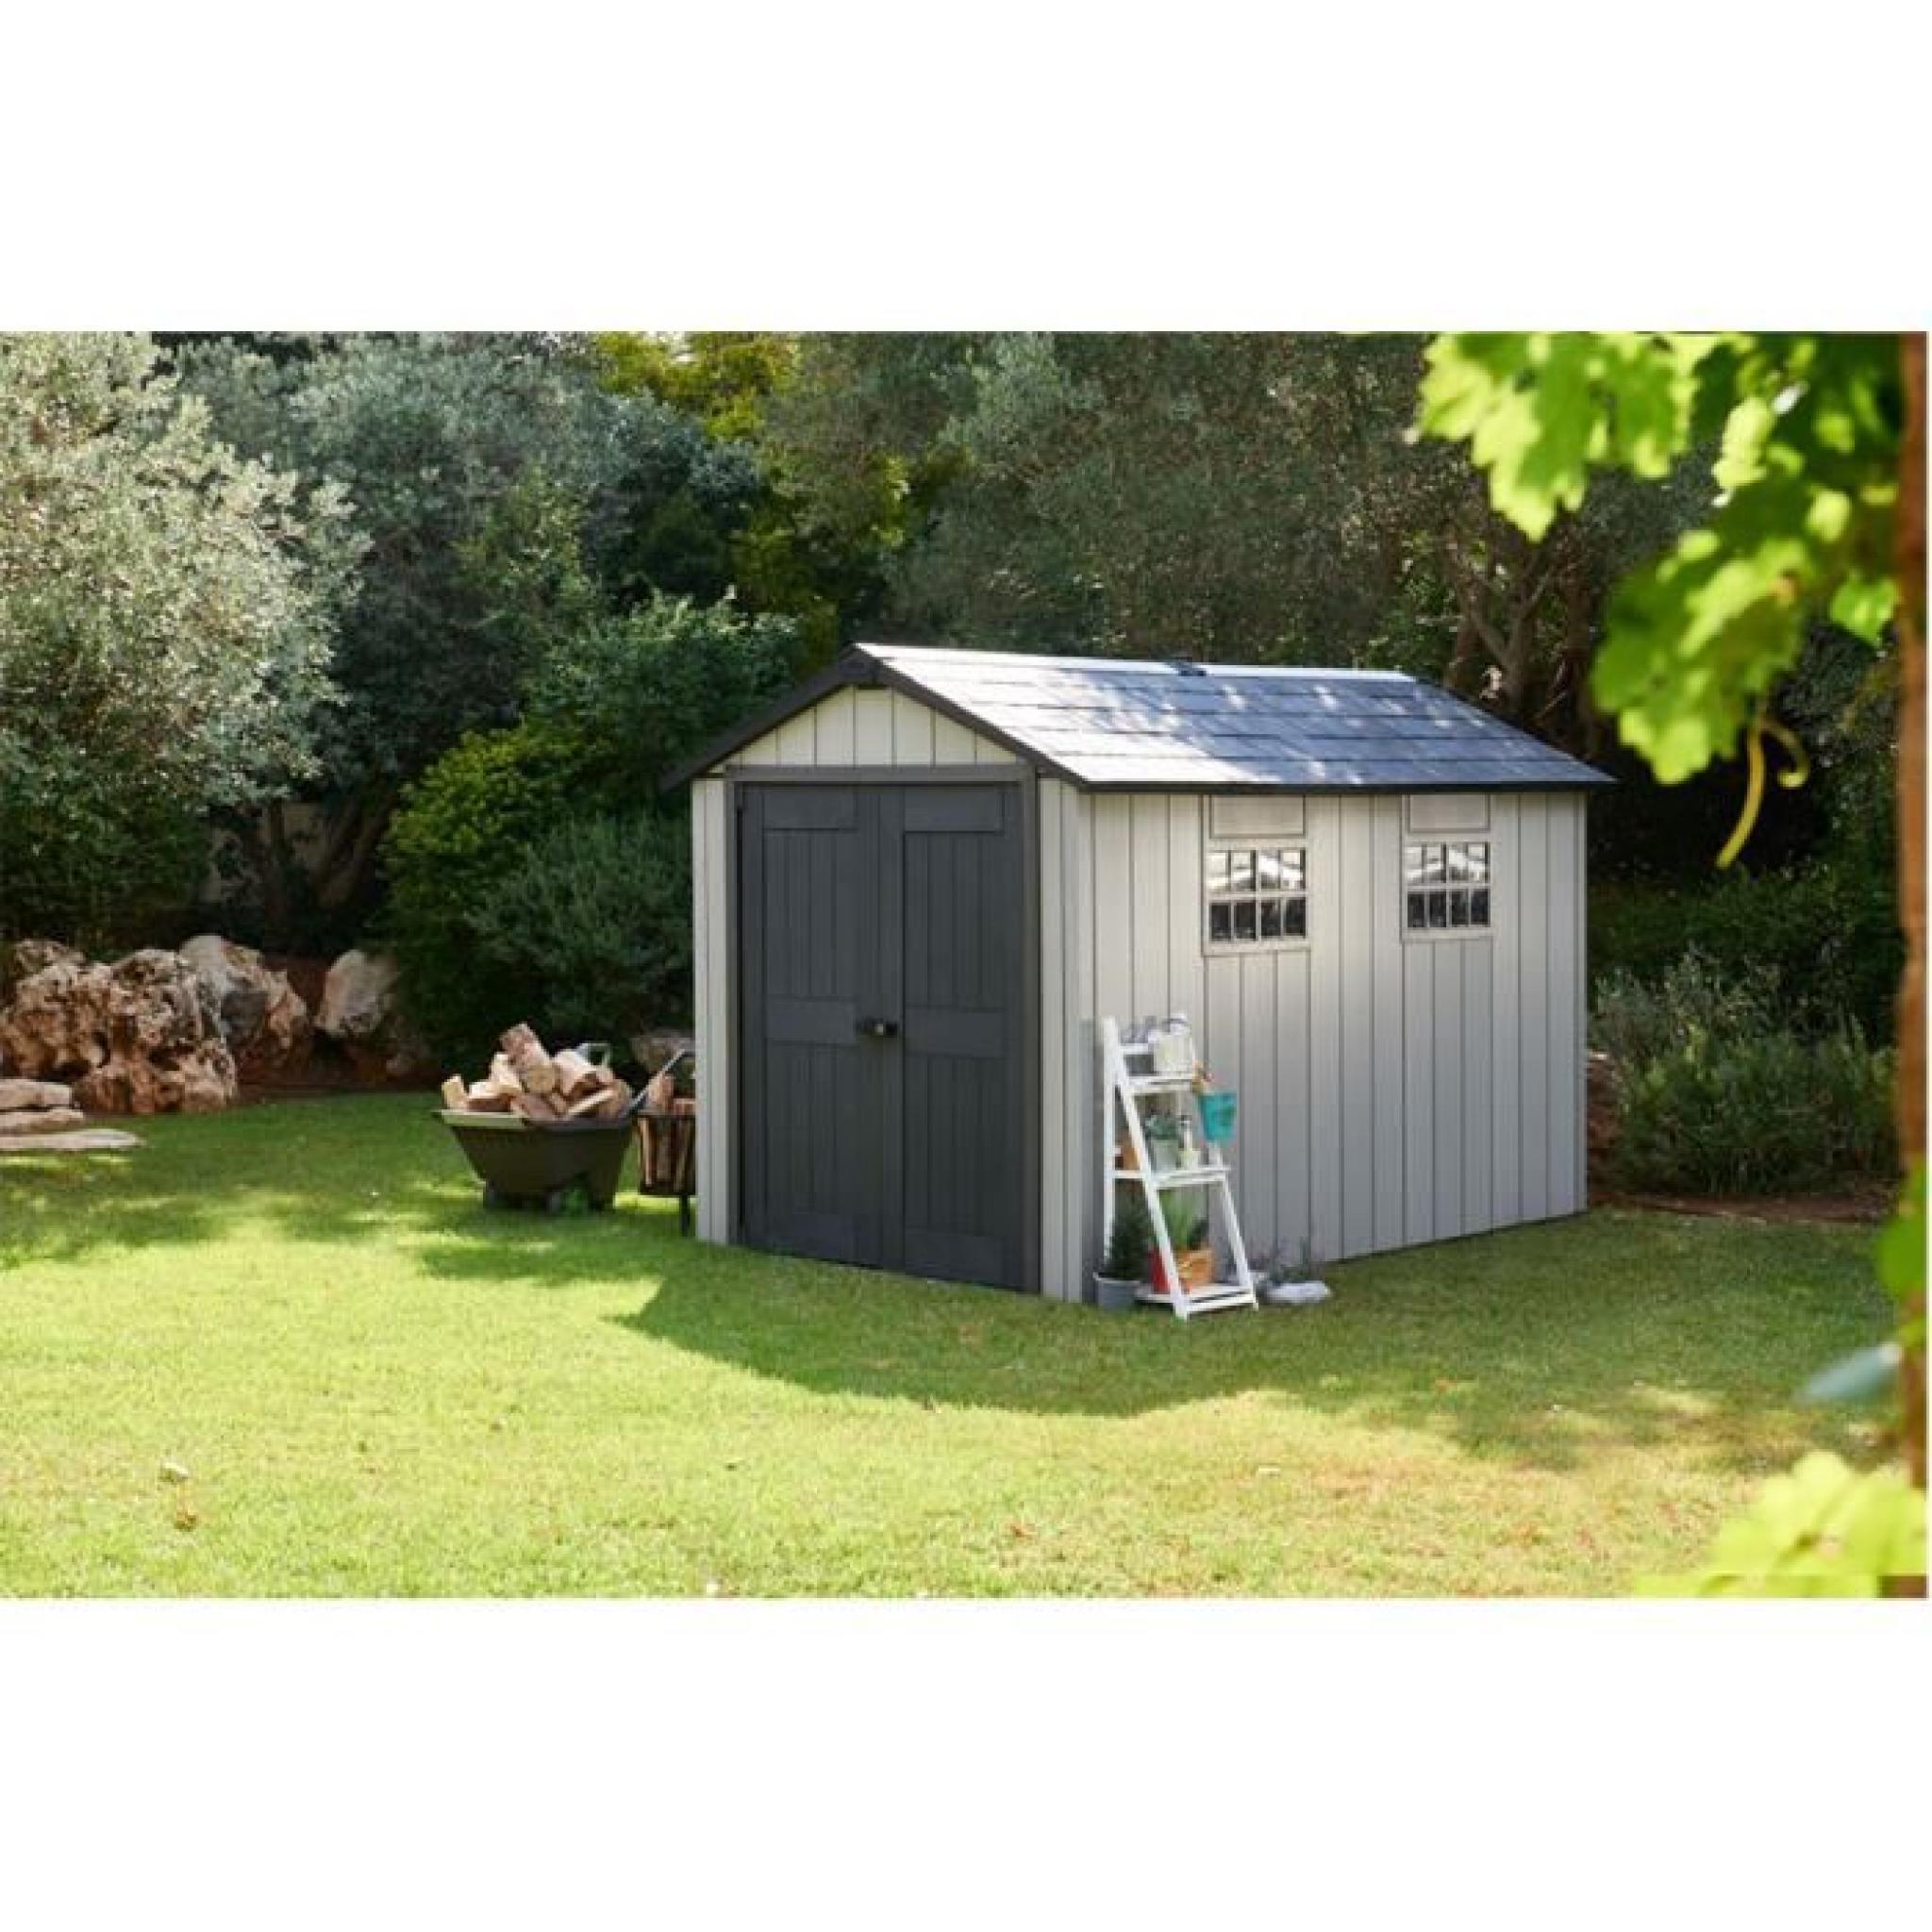 Abri de jardin en r sine coloris gris bross 229 x 223 5 - Abri jardin resine pas cher ...